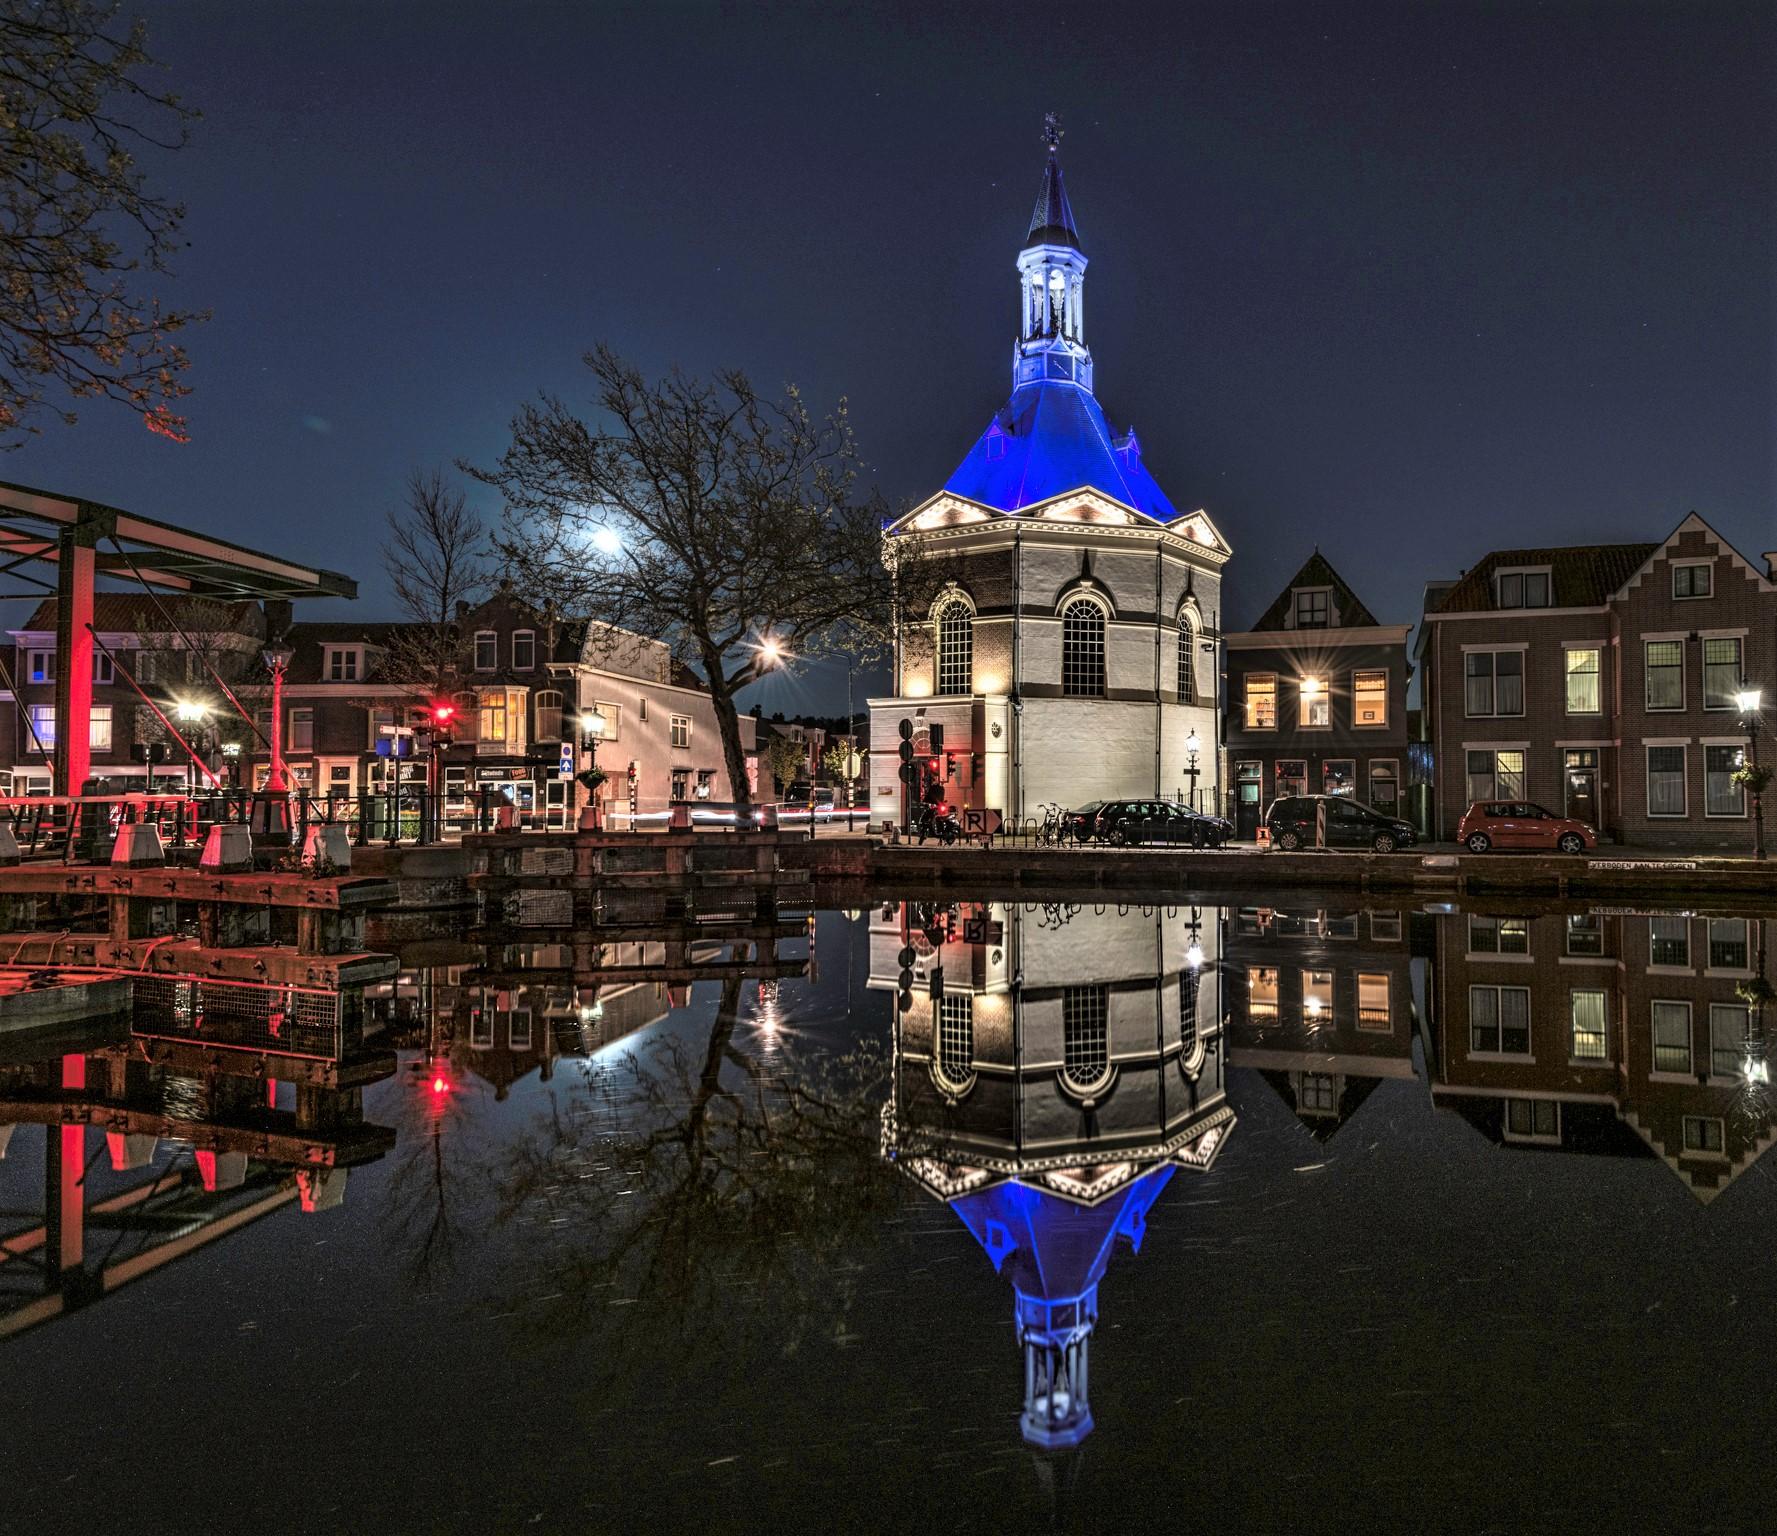 Dorpskerk, Leidschendam, Netherlands, Netherlands